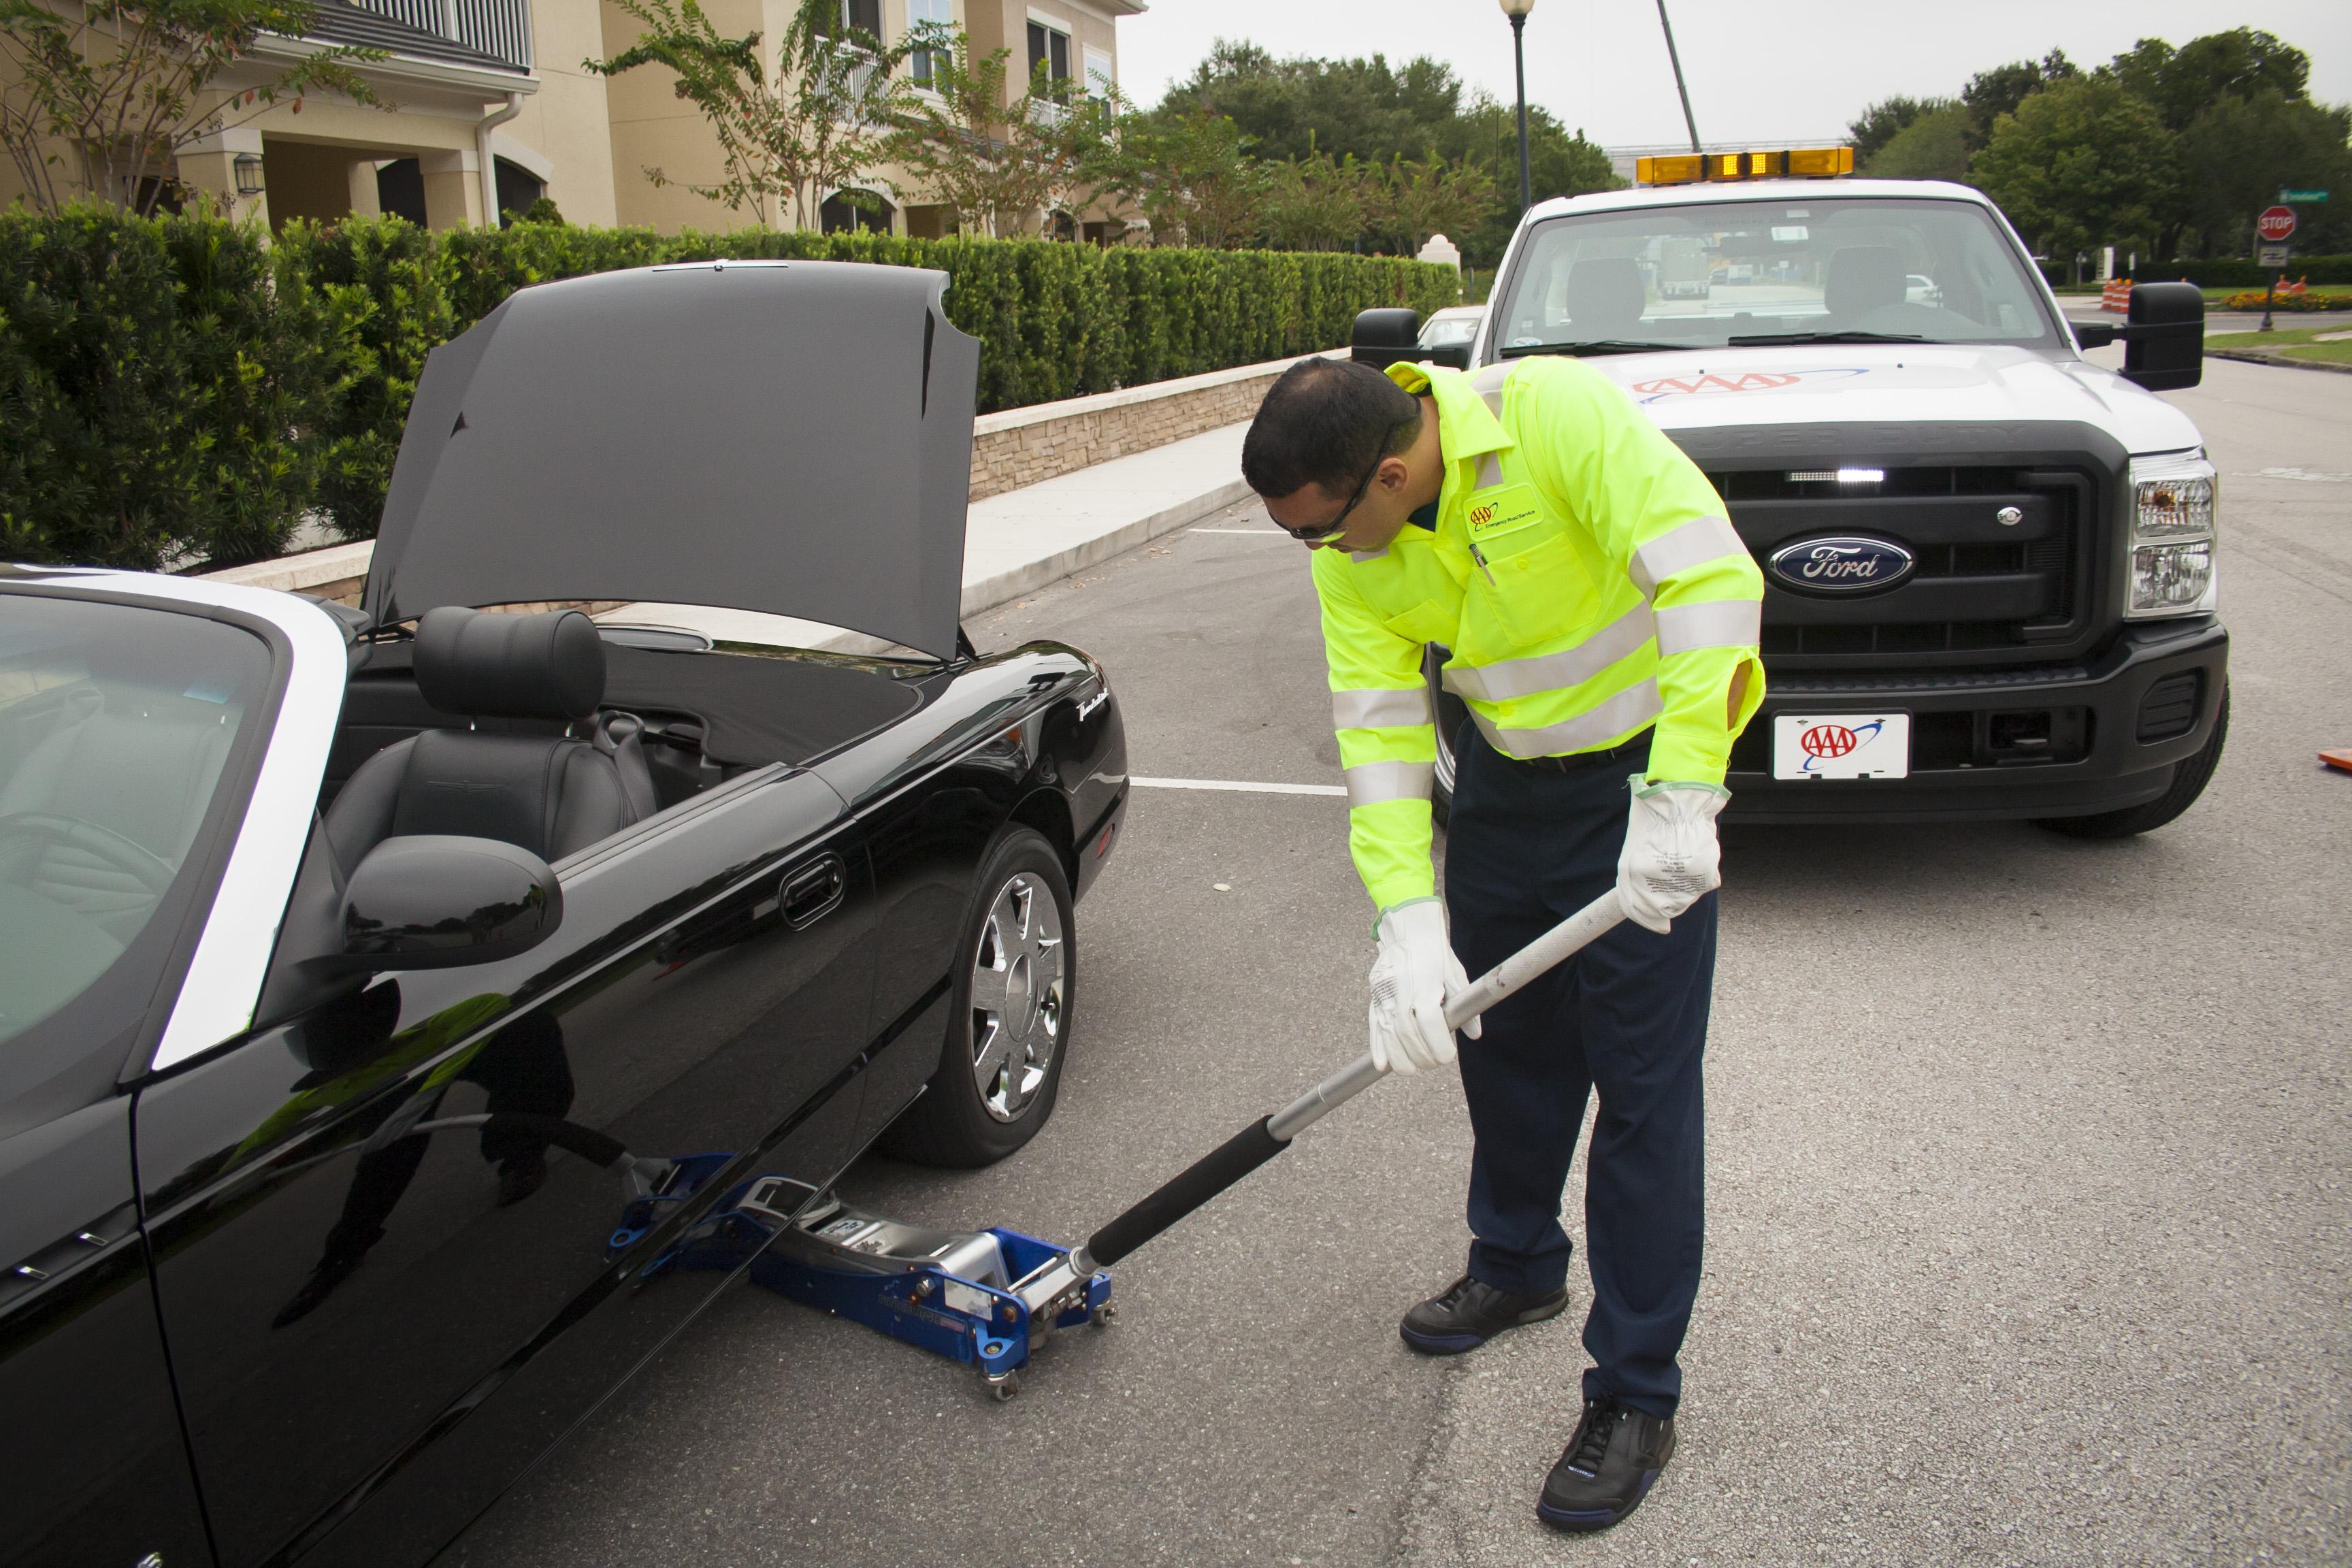 Roadside assistance photo